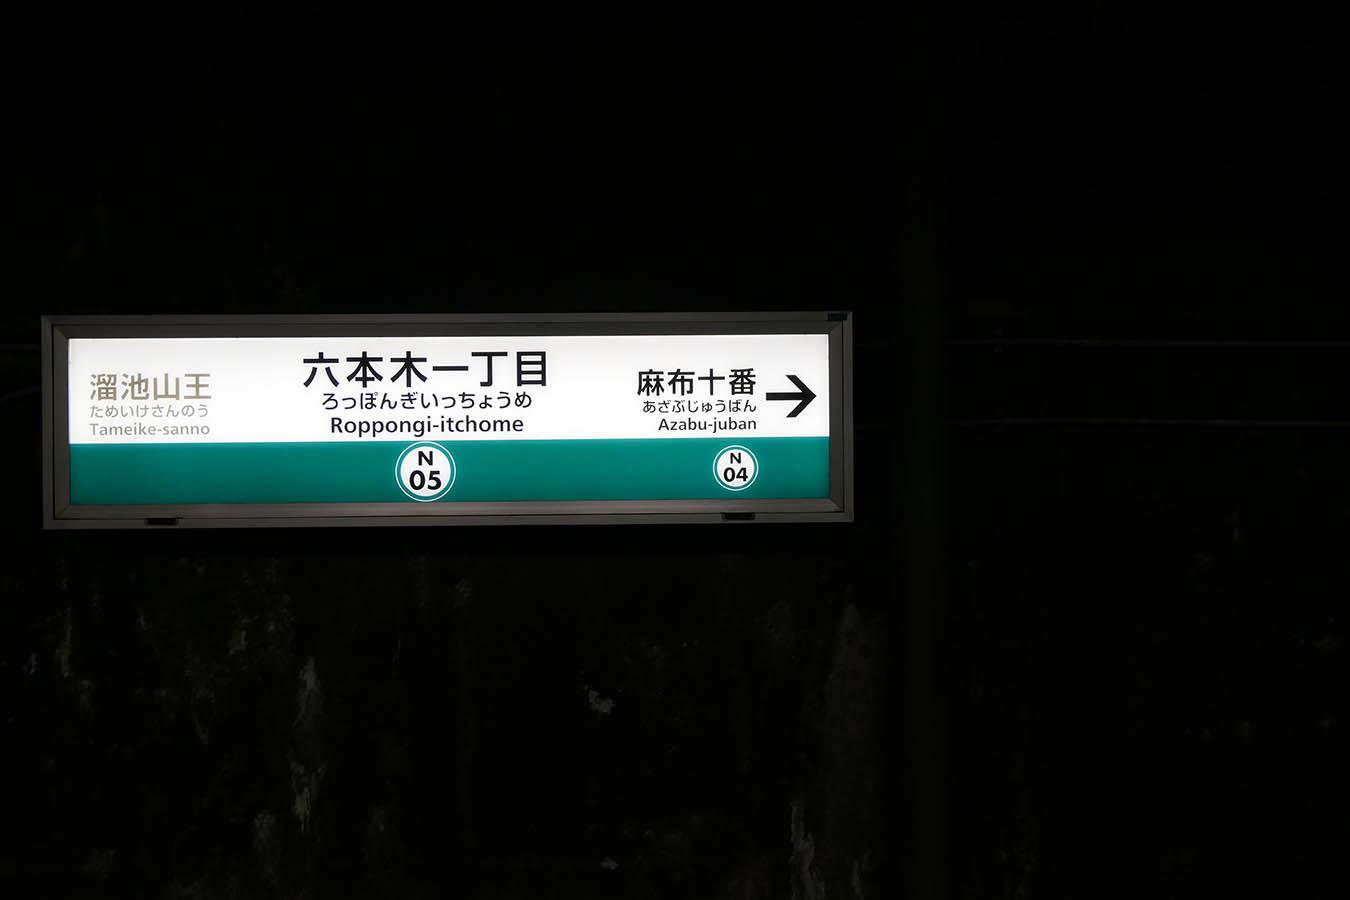 N05_photo03.jpg